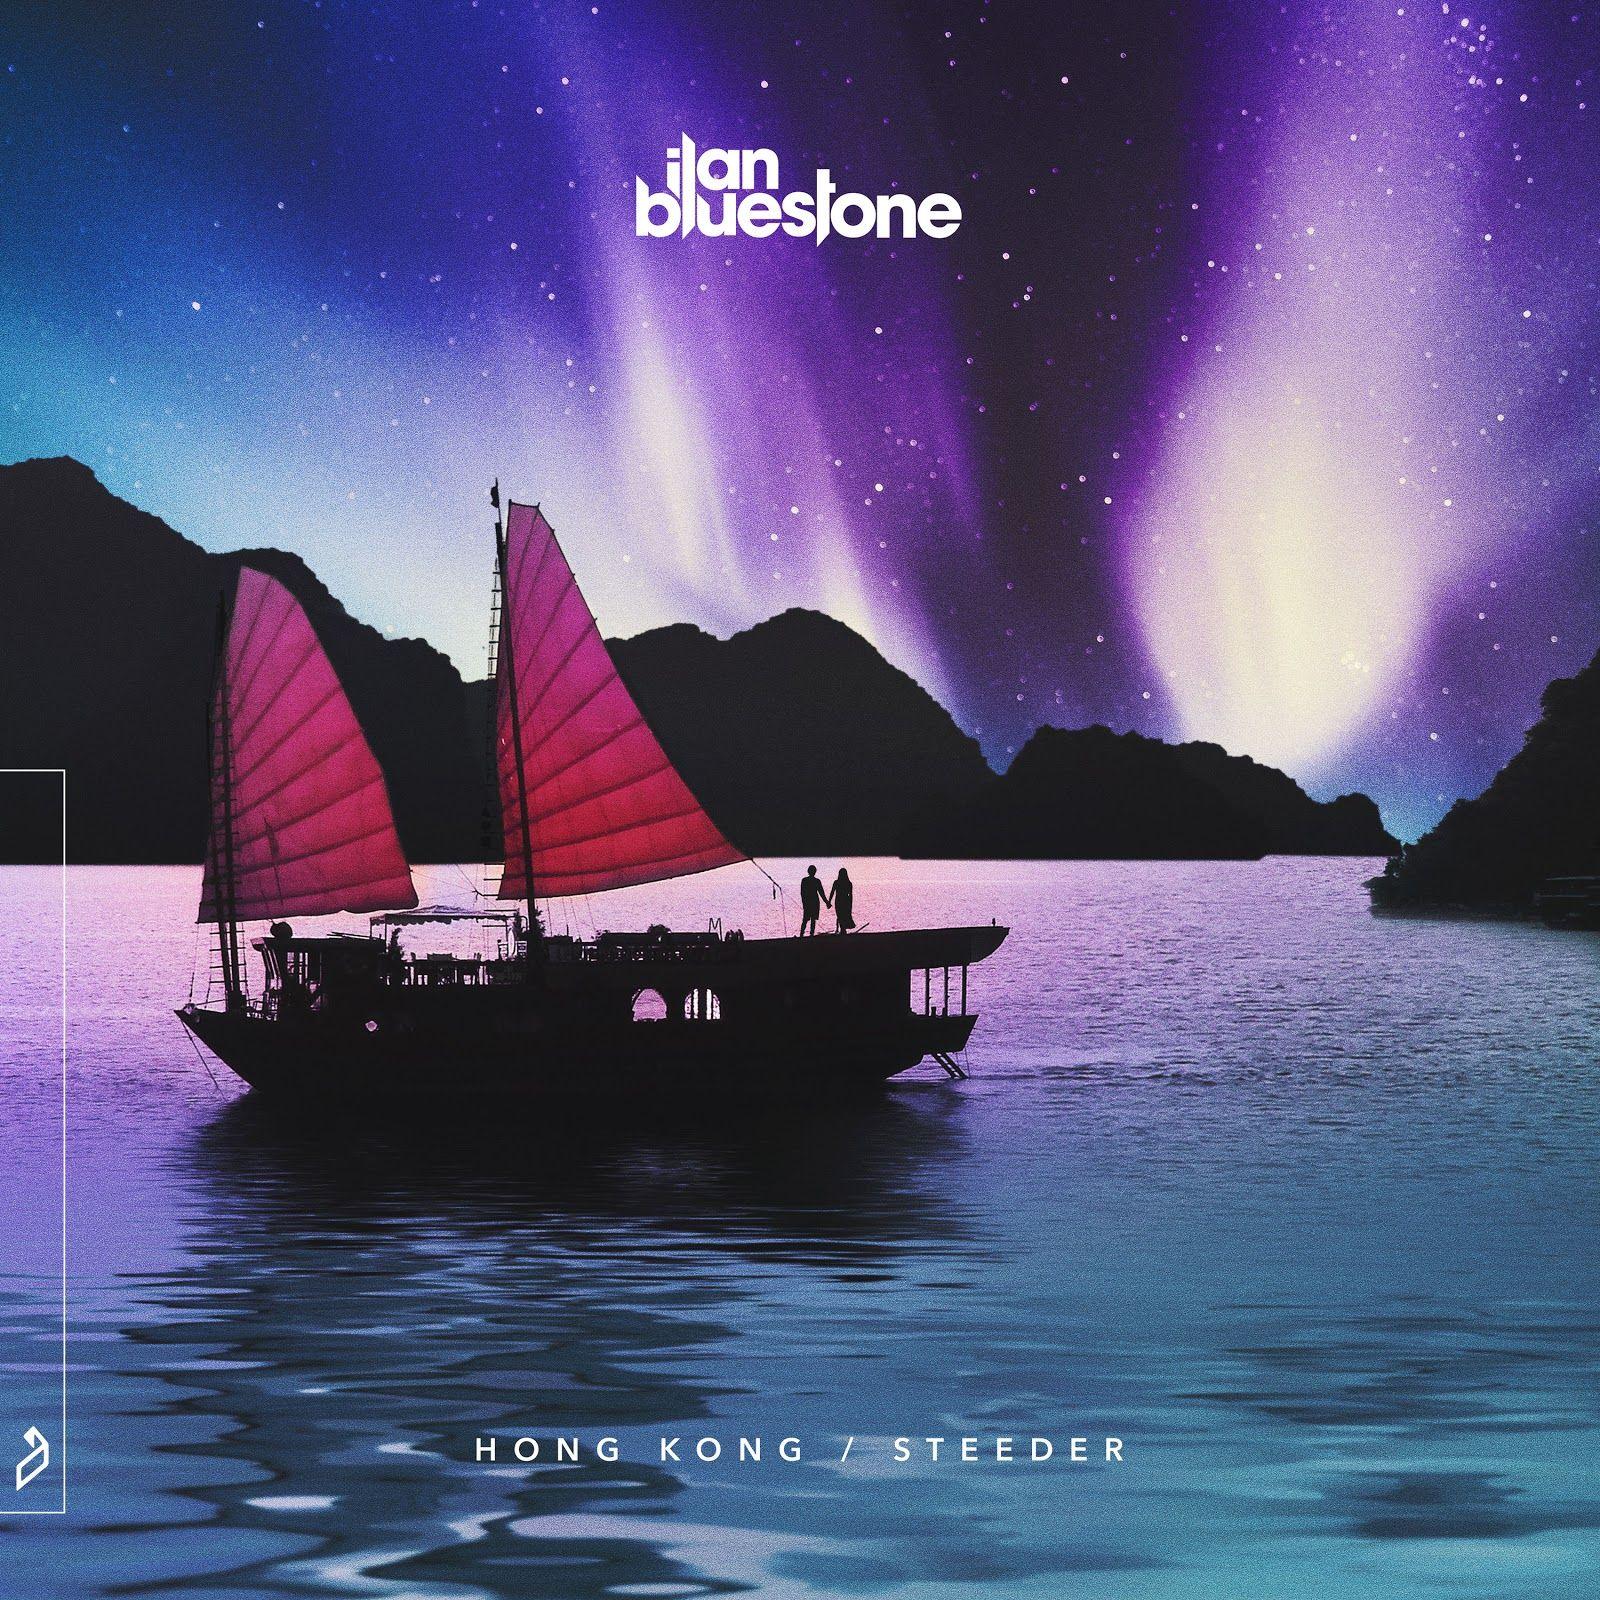 ilan-bluestone-hong-kong-steeder_3000x3000.jpg